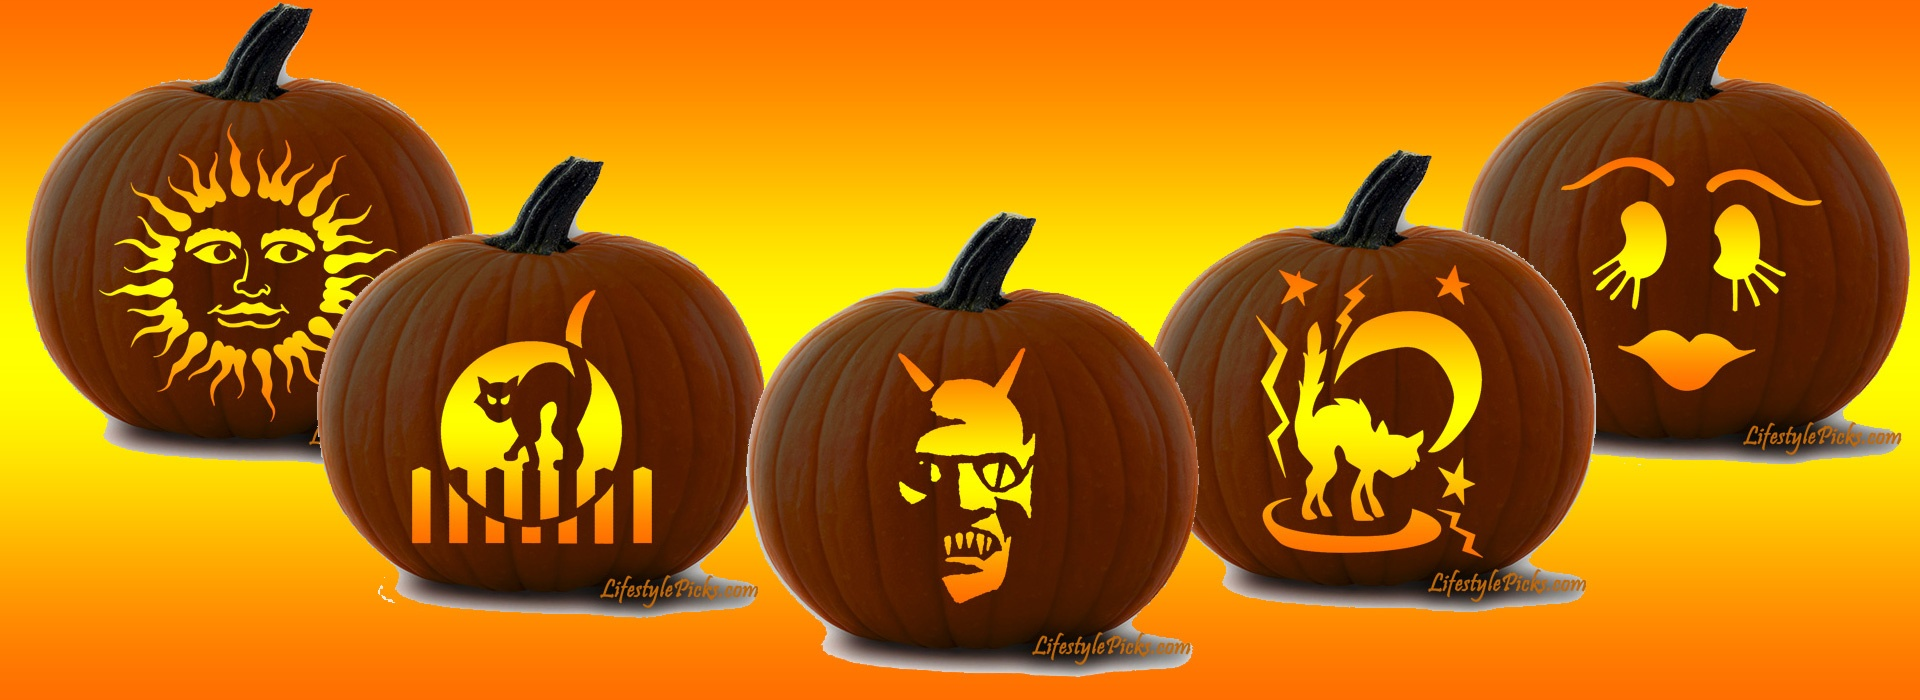 Free Pumpkin Carving Stencils - Pirate, Cat, Aztec Sun, Michael - Free Printable Pumpkin Carving Stencils